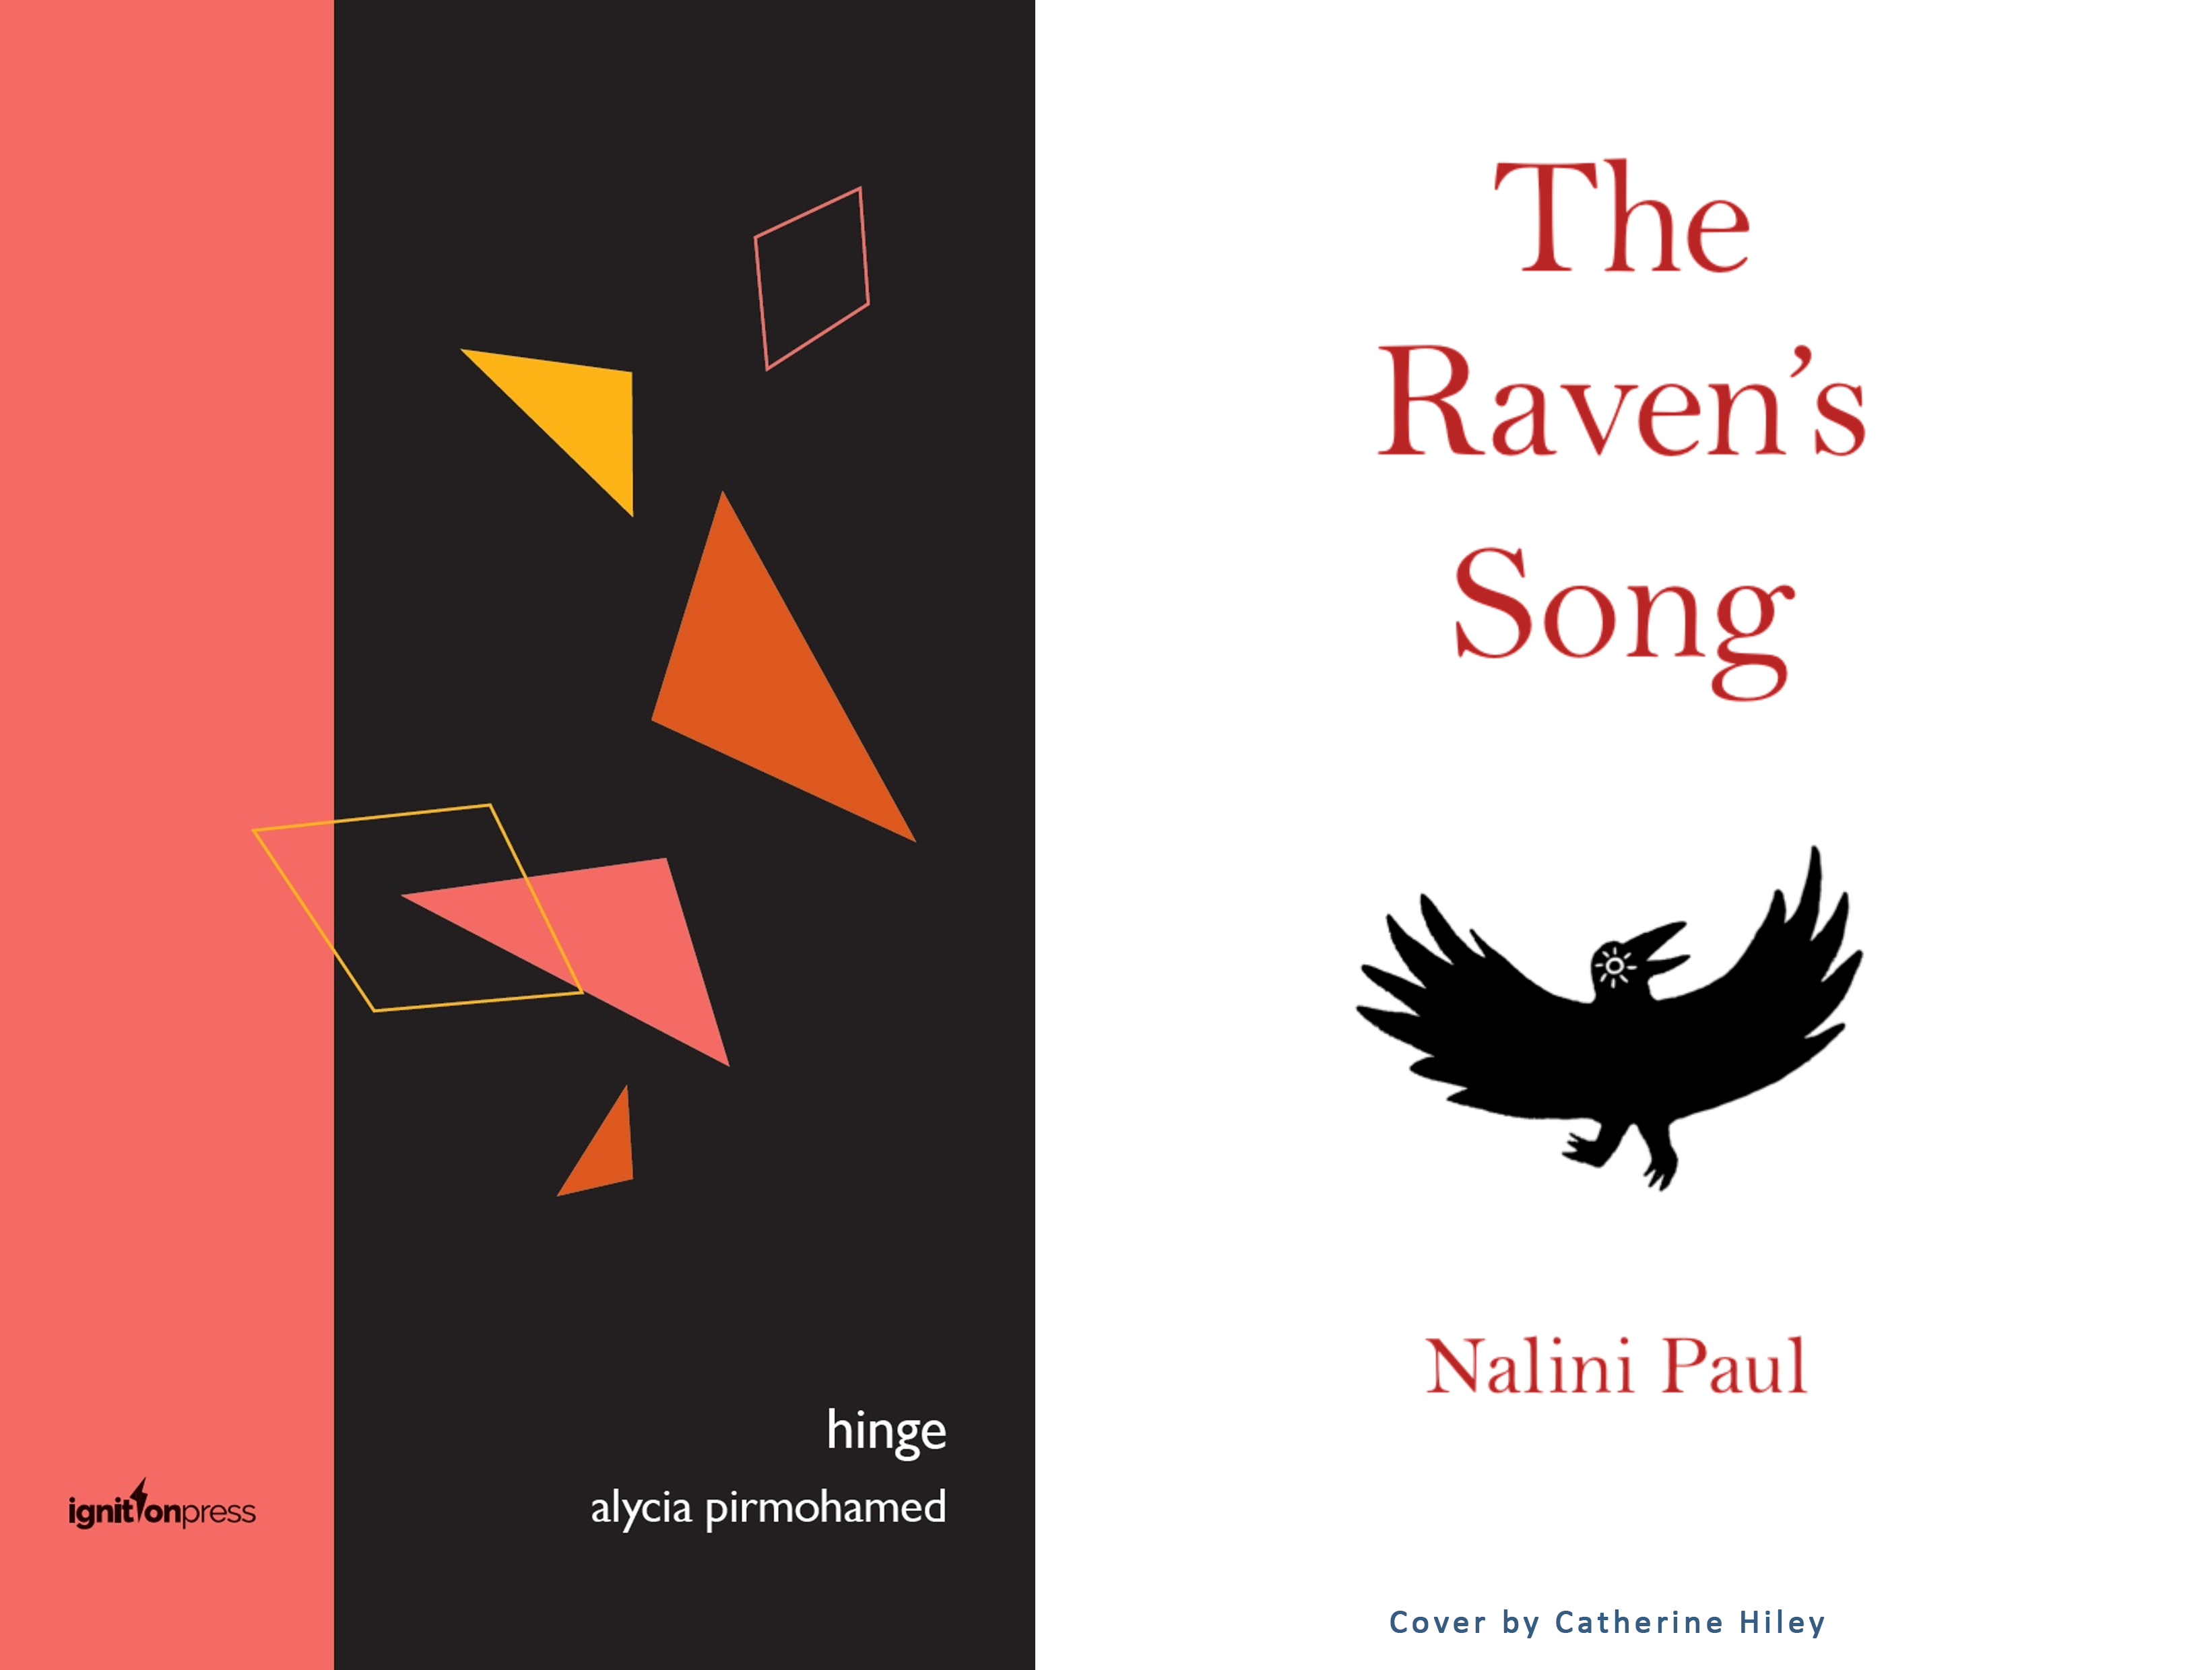 SWC-19thNovember2020-Event-RavensSong and Hinge